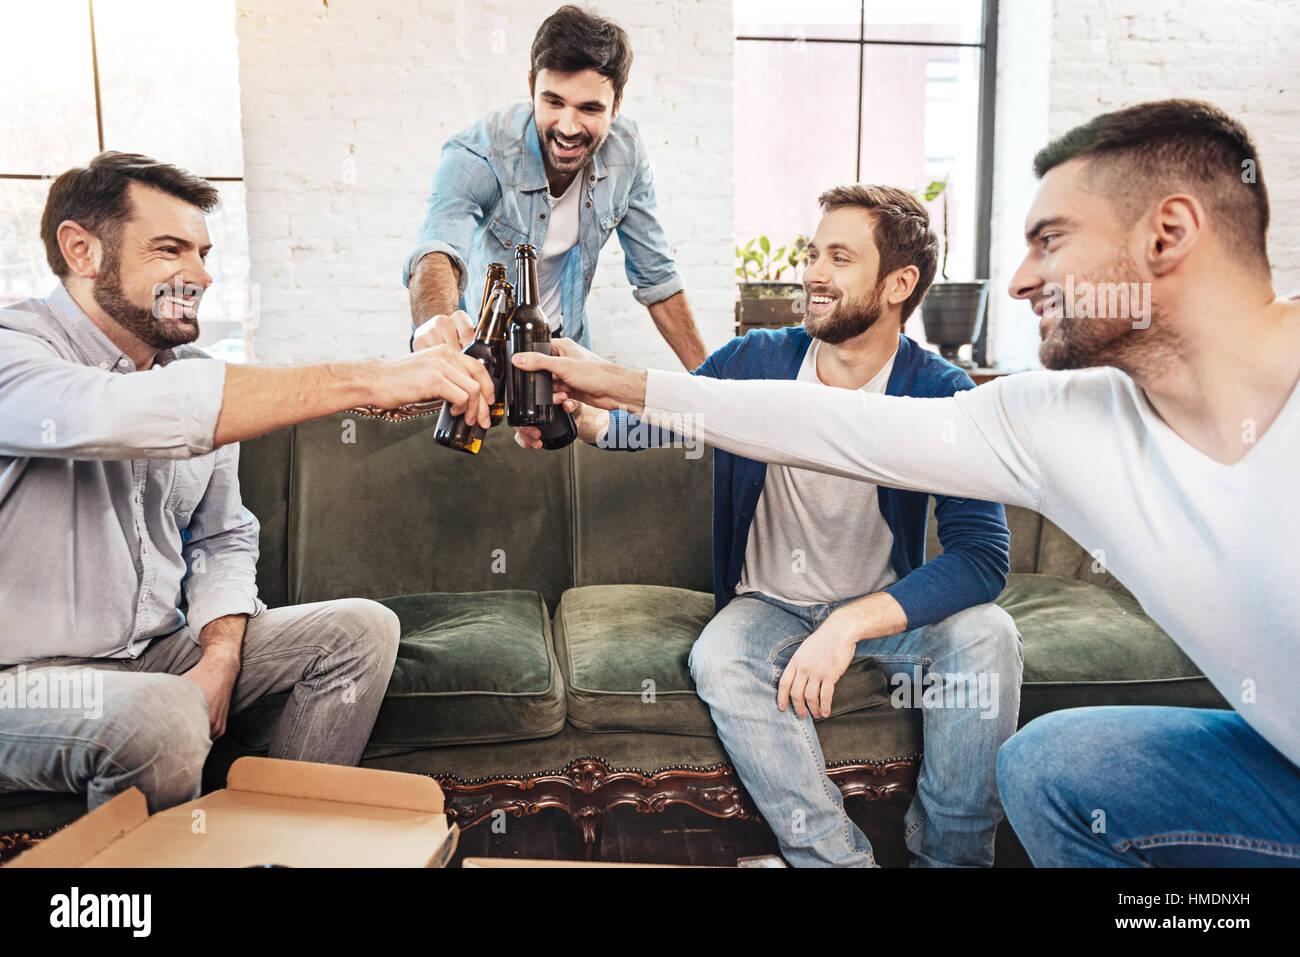 Joyful positive men clinking bottles - Stock Image